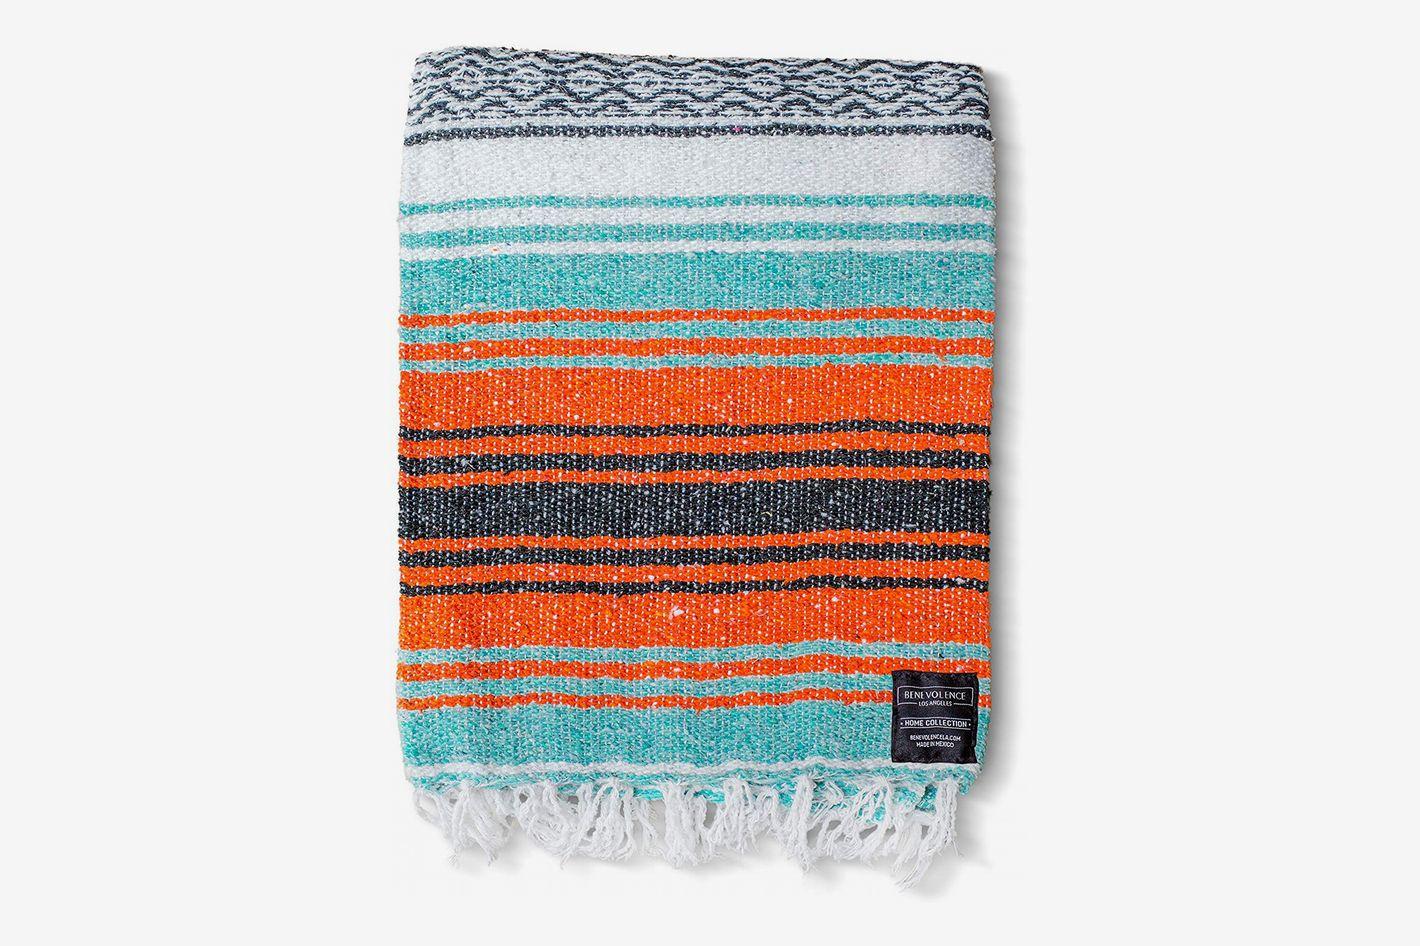 Benevolence LA Mexican Beach Blanket